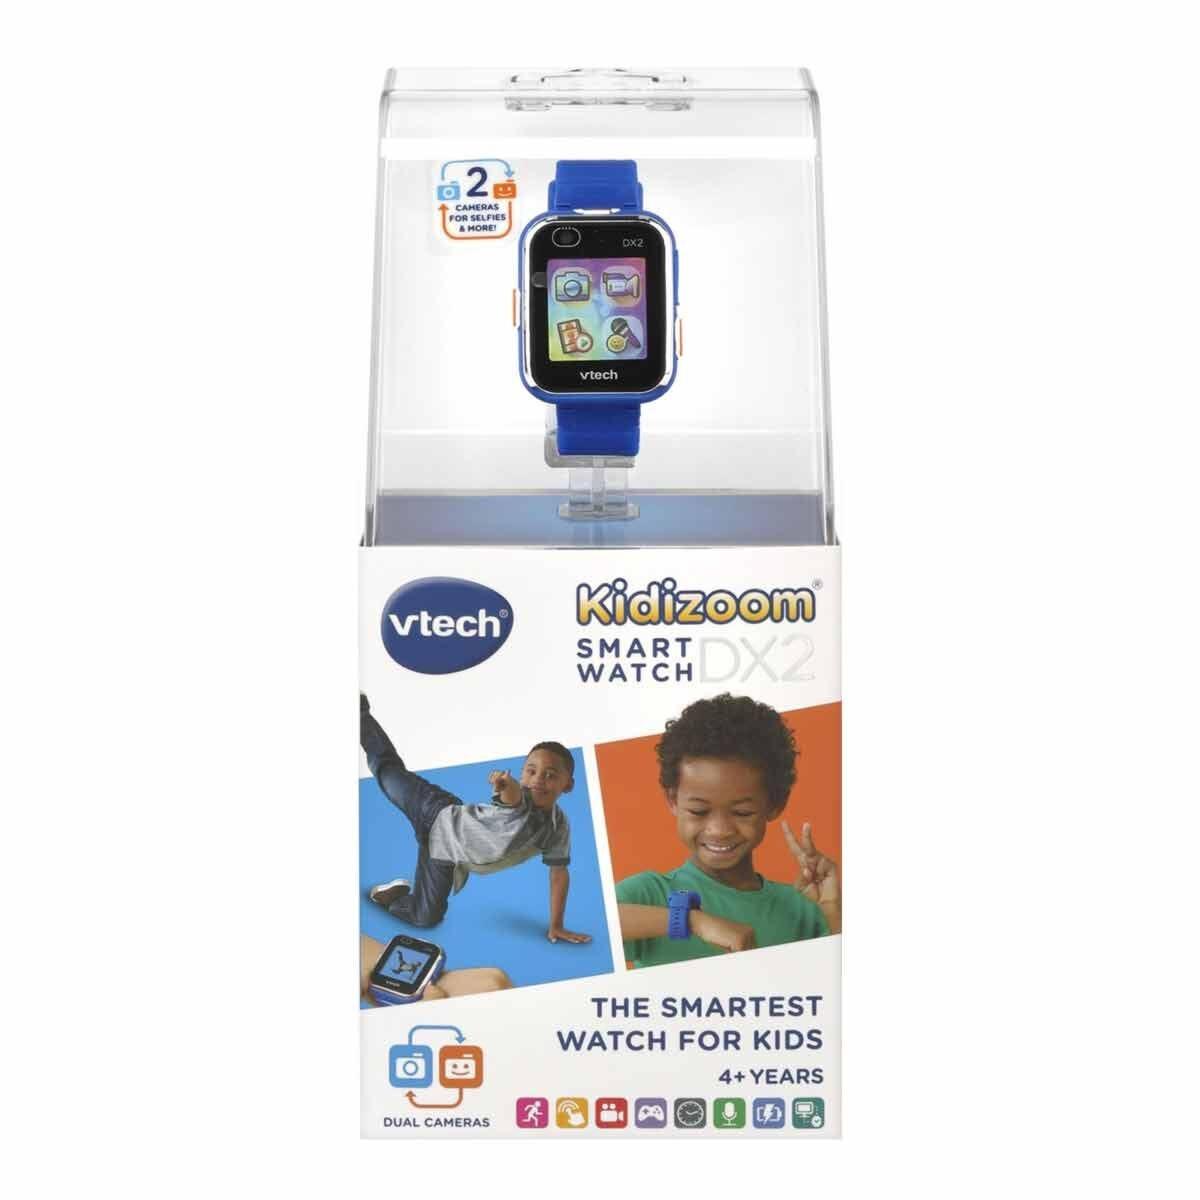 Vtech Kidizoom Smart Watch DX2 Blue